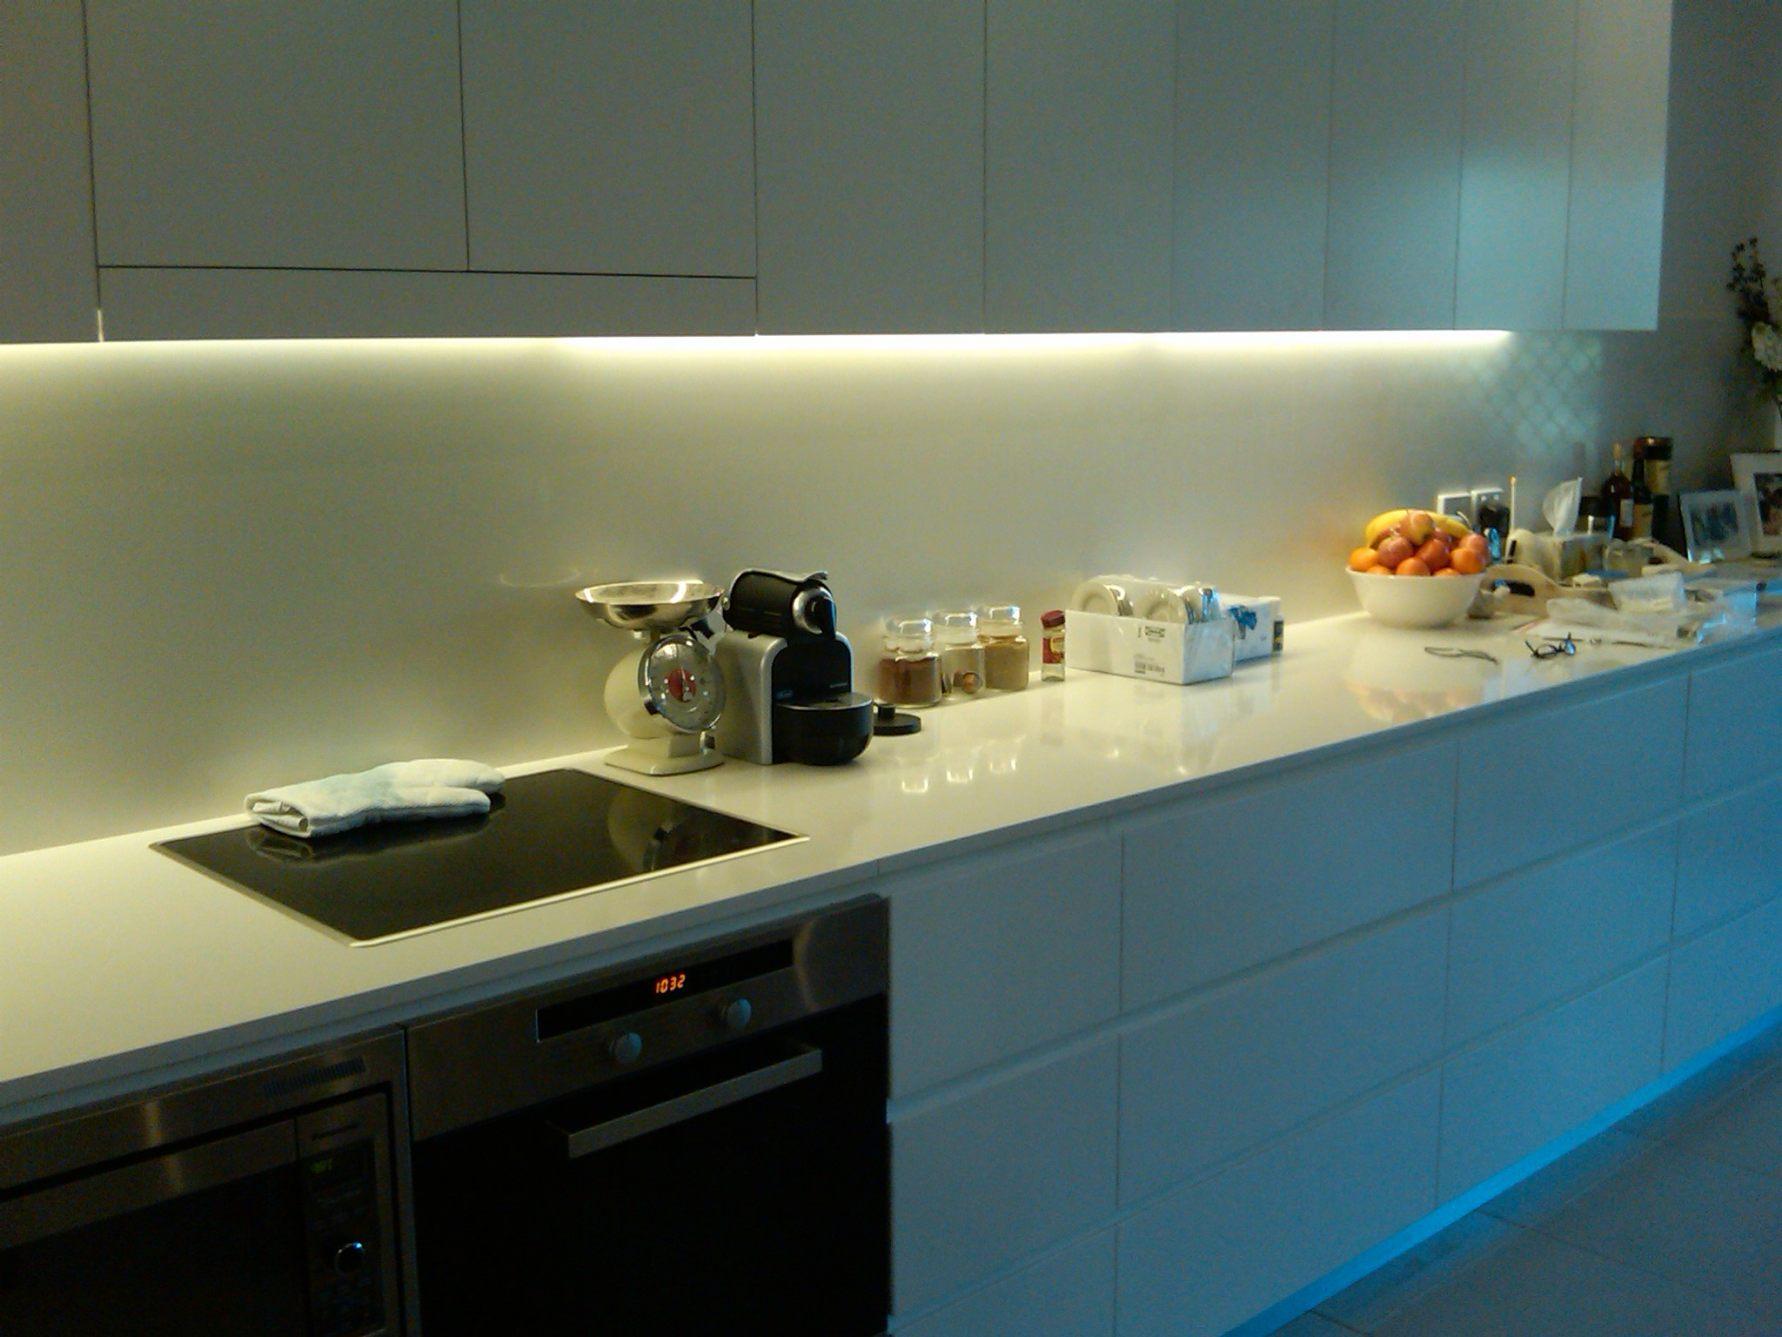 для подсветка на кухне под шкафами светодиодами фото умножения